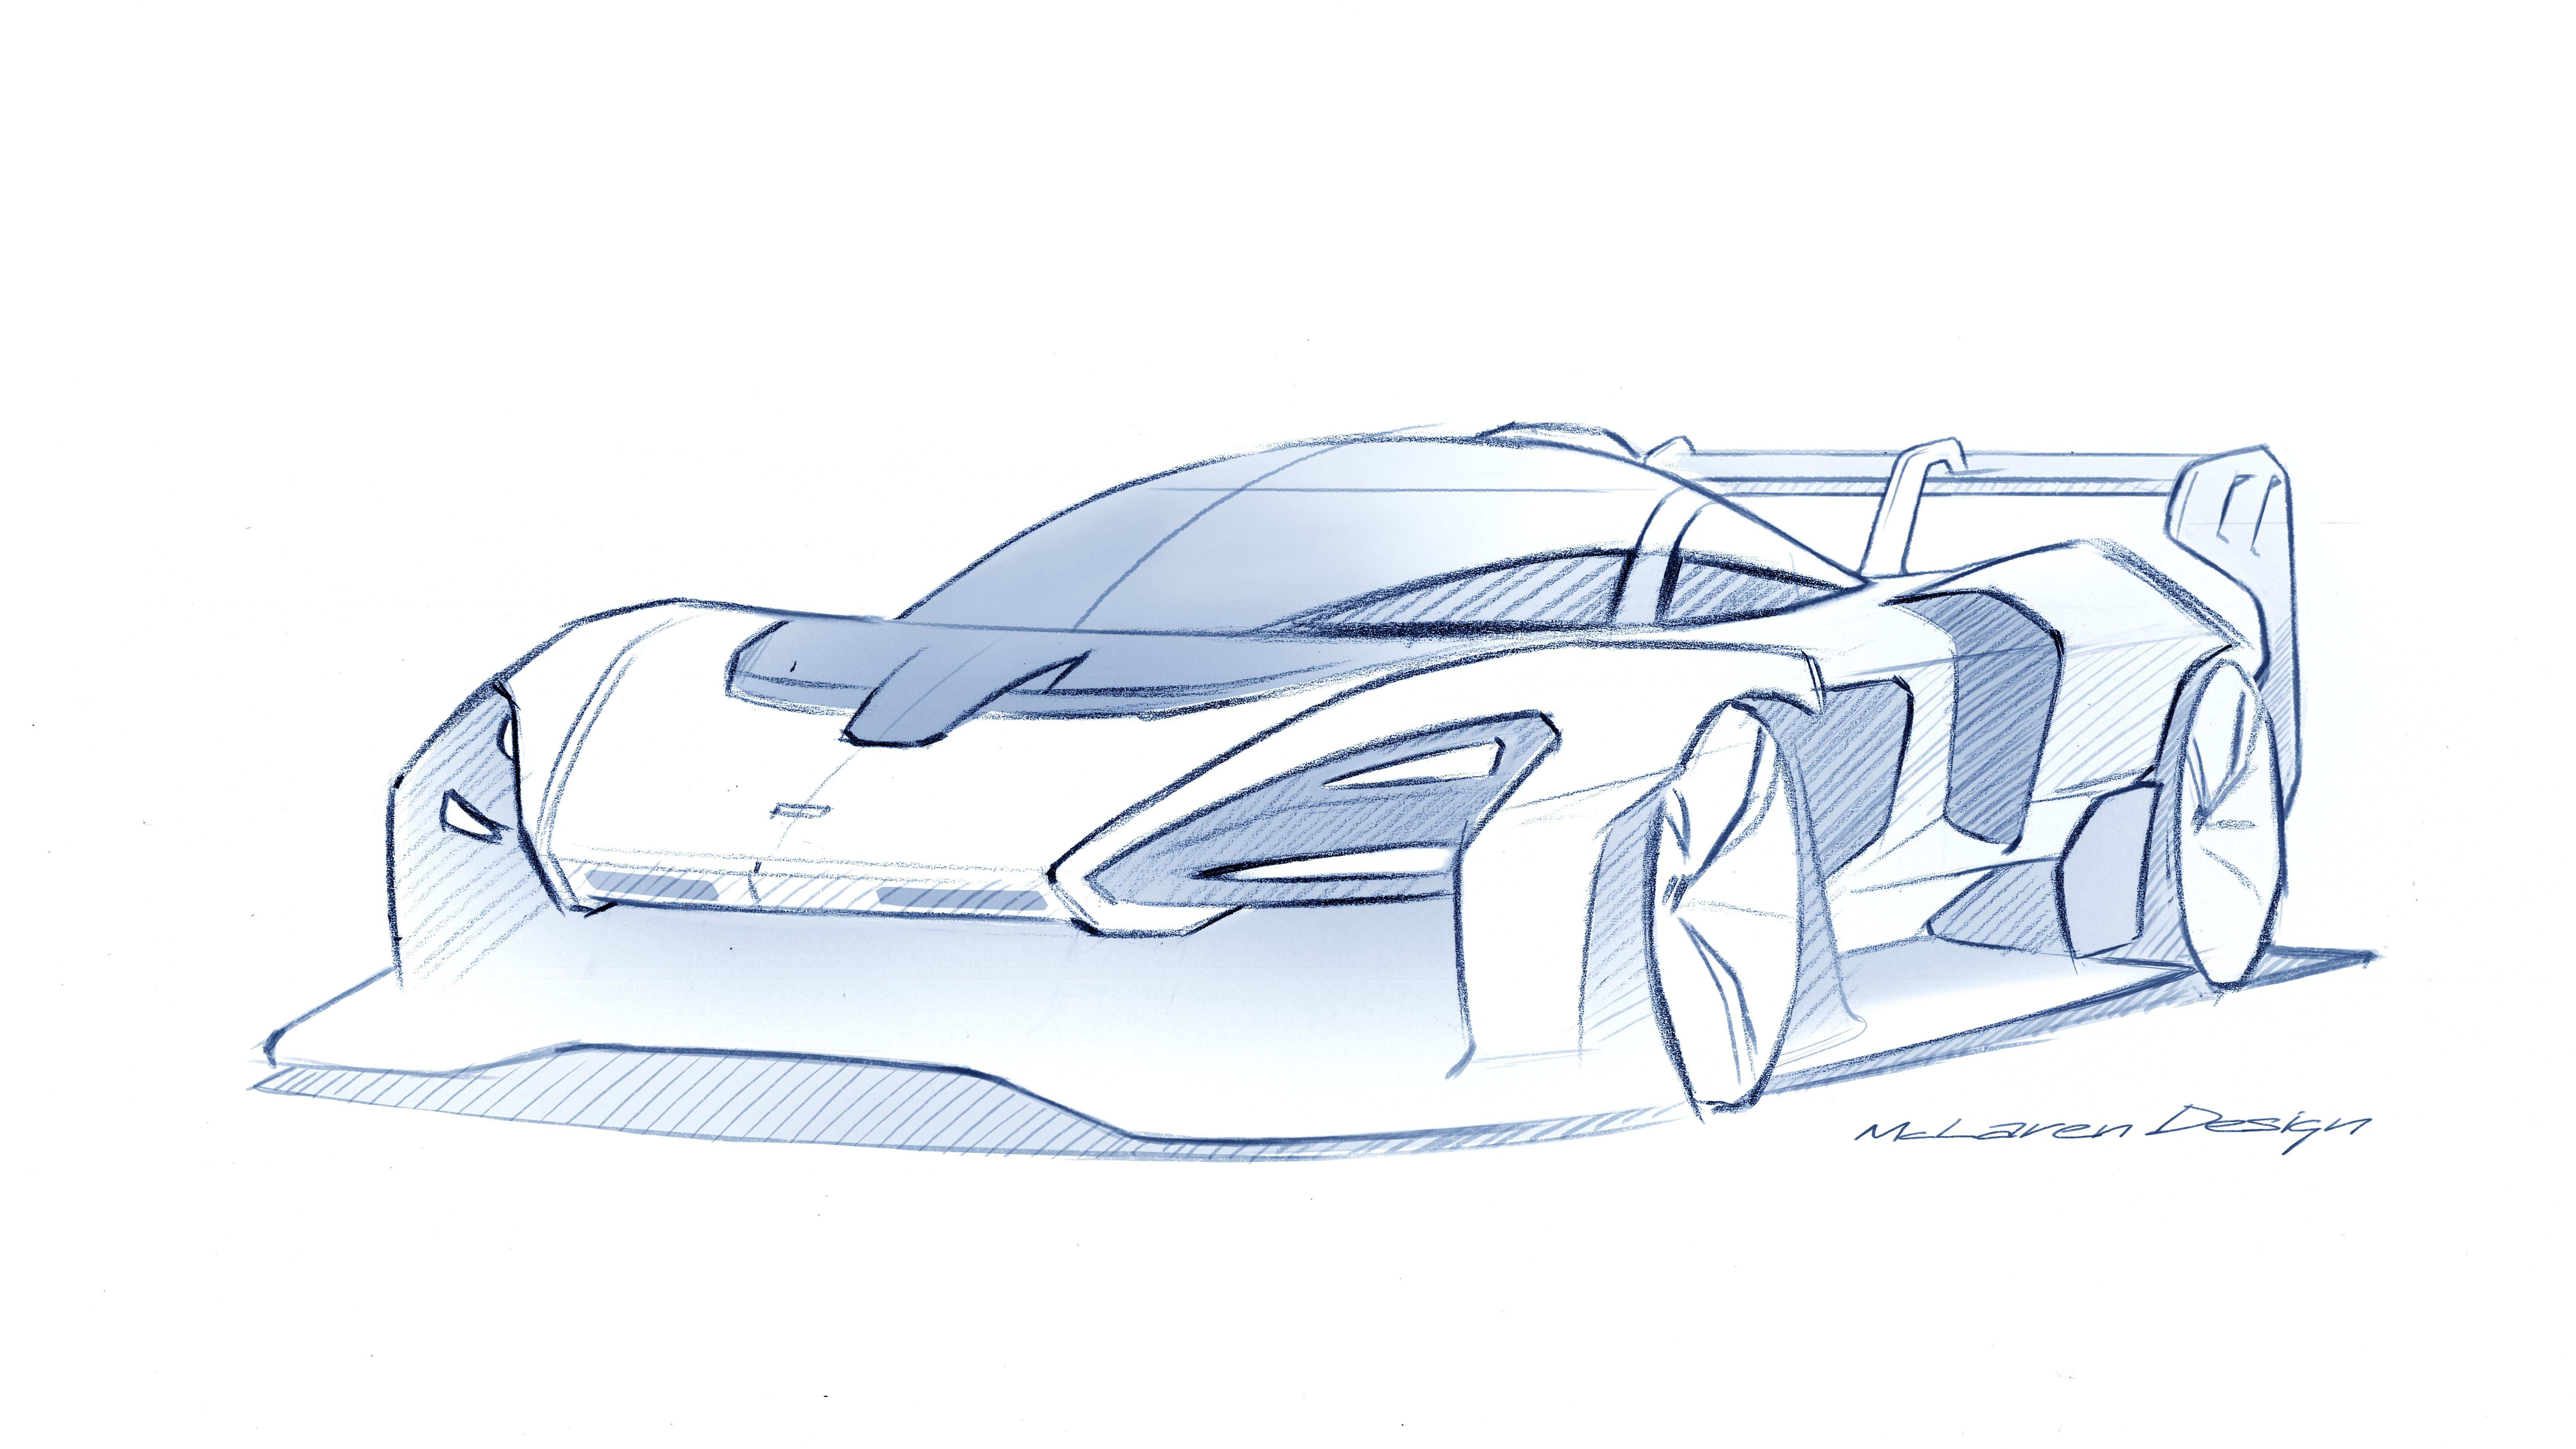 2020 Mclaren Senna Gtr Top Speed Car Design Design Sketch Car Drawings